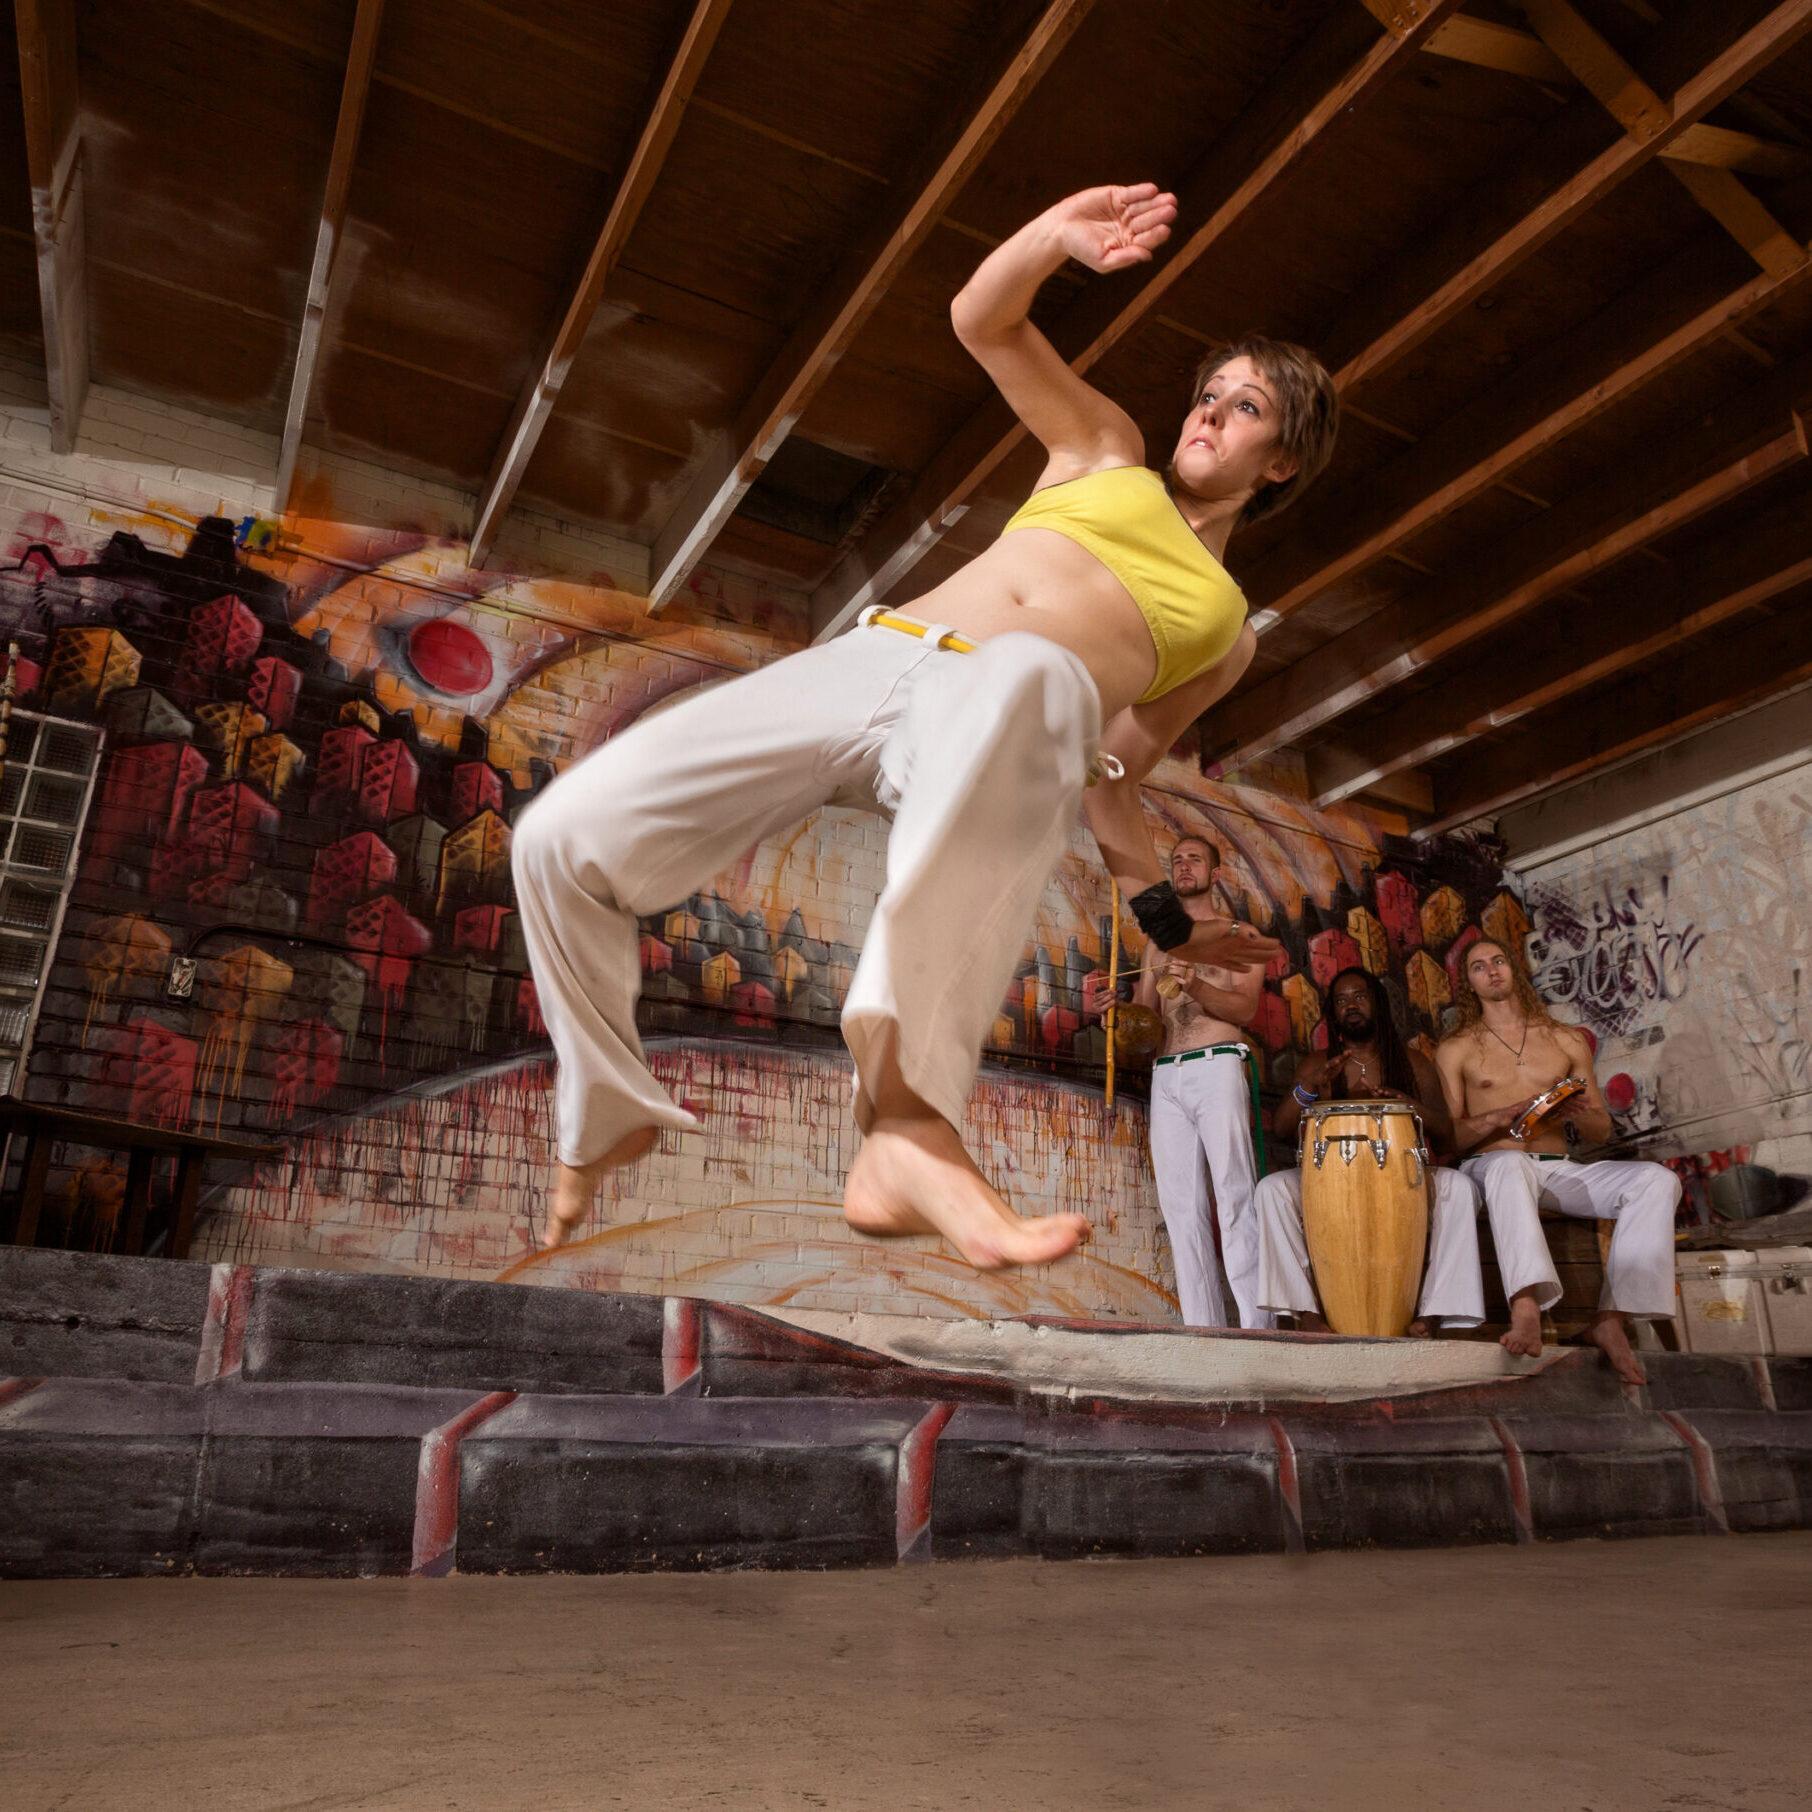 Flexible woman performing a capoeira jumping kick